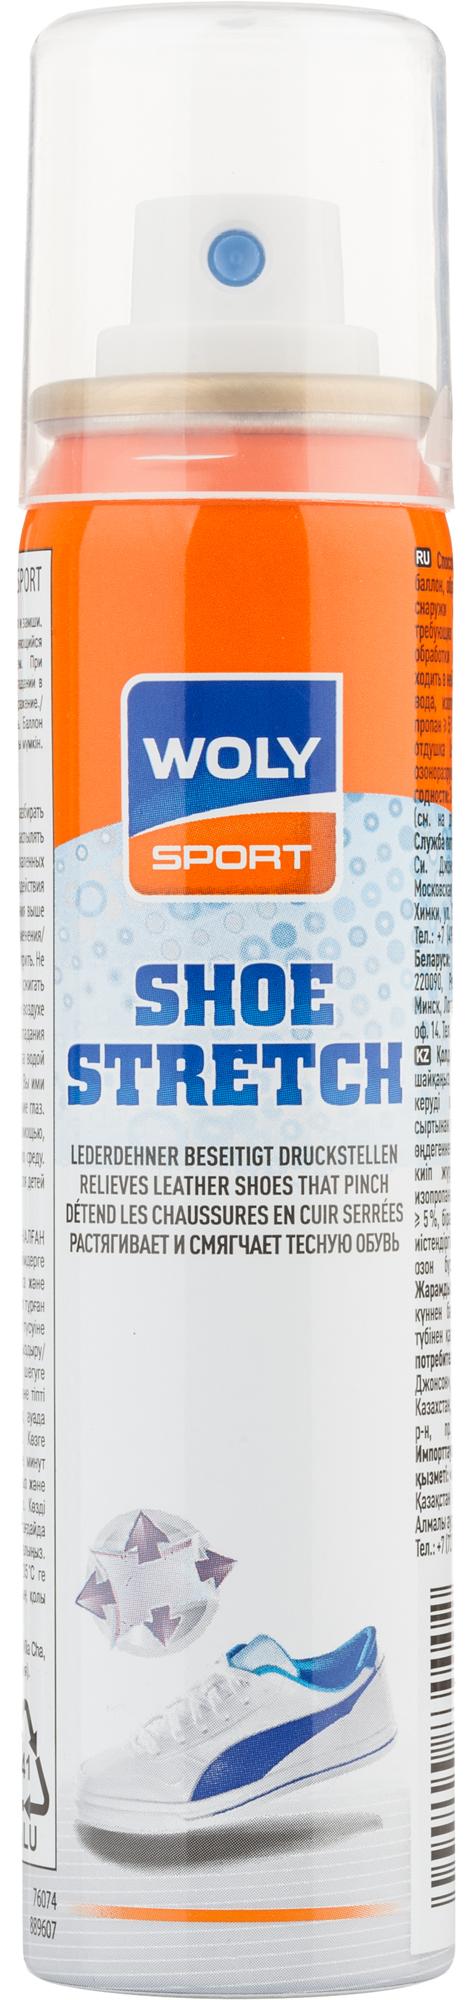 Woly Средство для растяжки кожи Sport Shoe Stretch, 75 мл